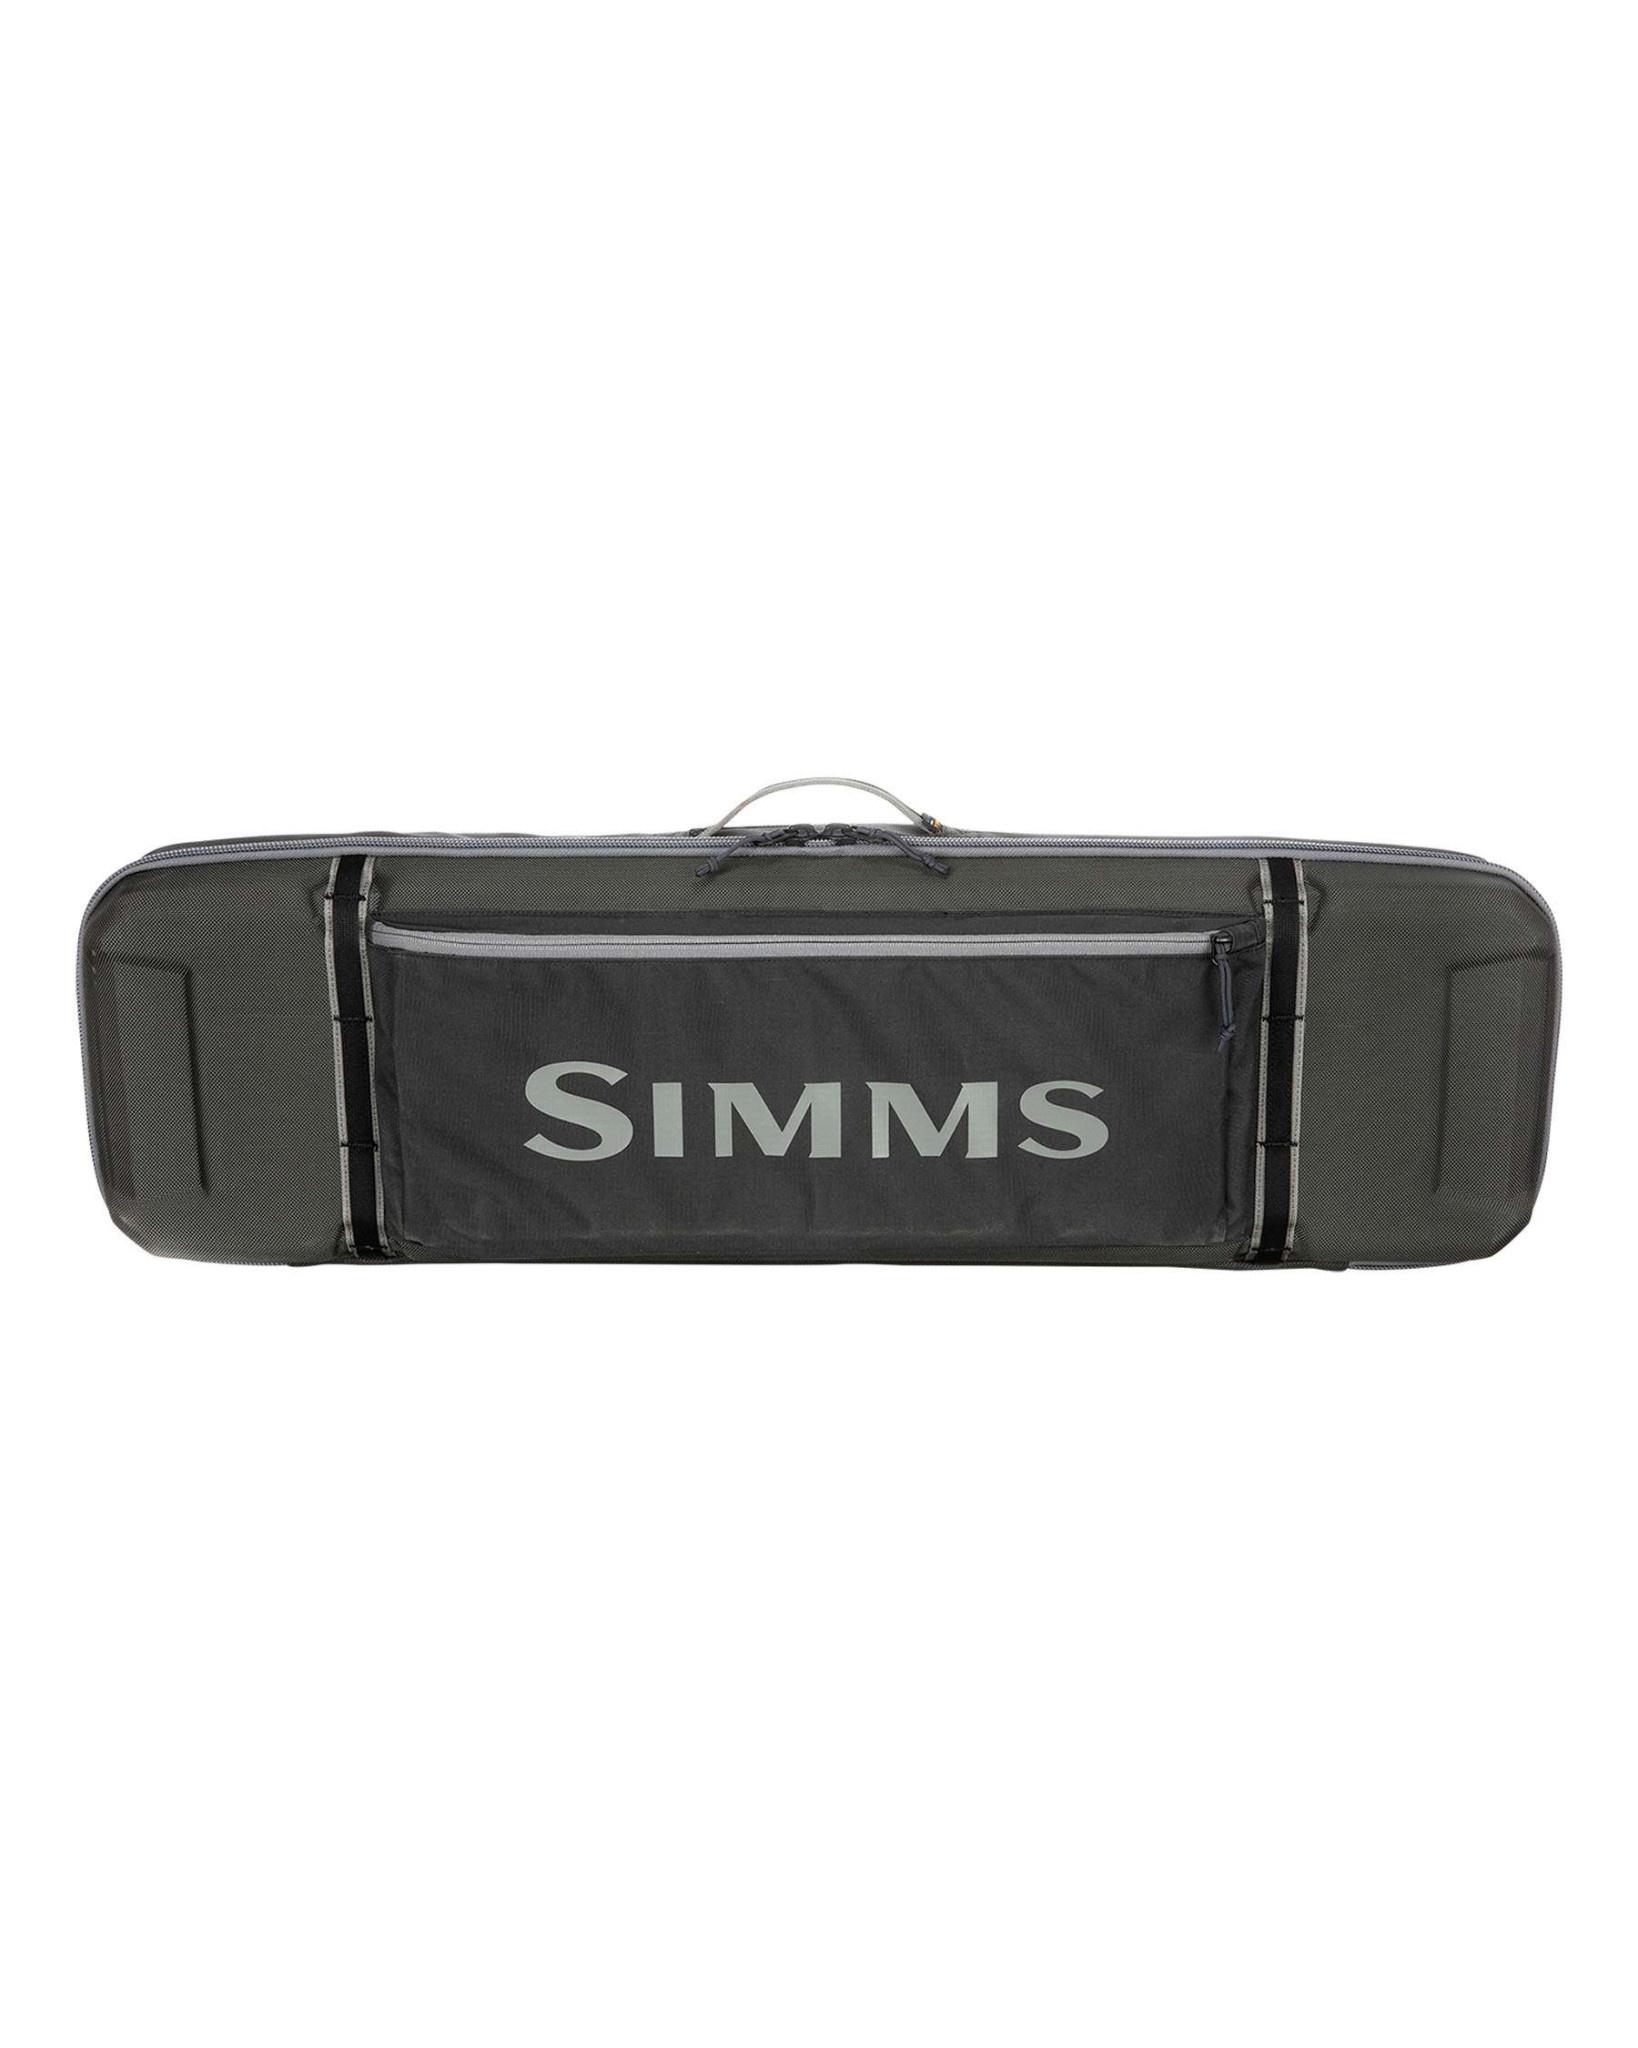 Simms GTS Rod/Reel Vault